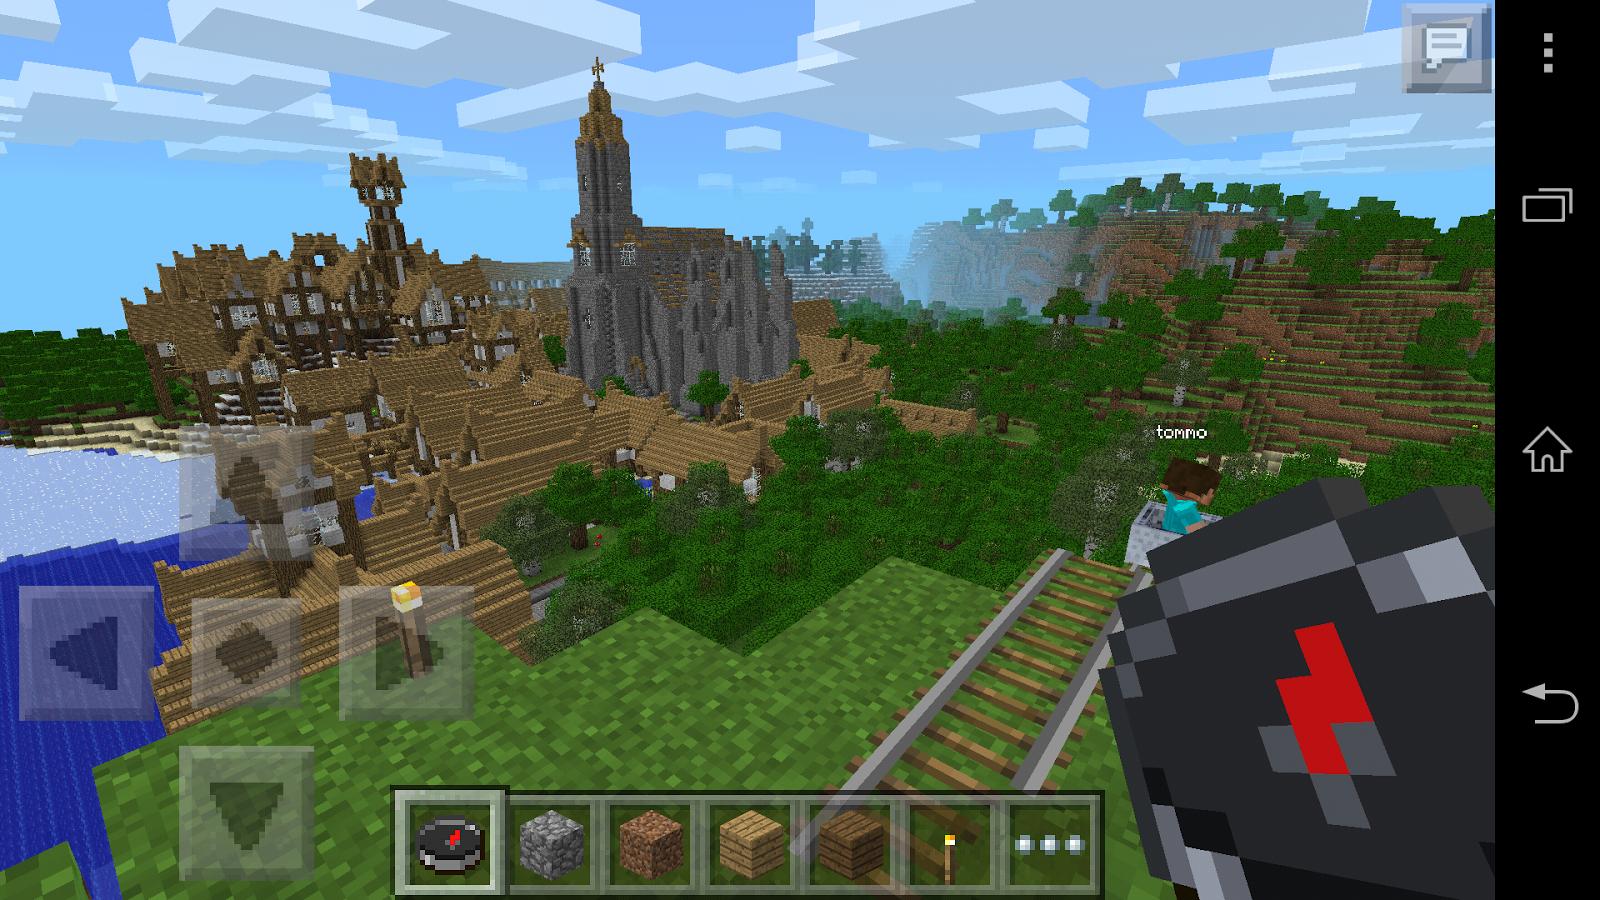 Minecraft: Pocket Edition worlds will get bigger